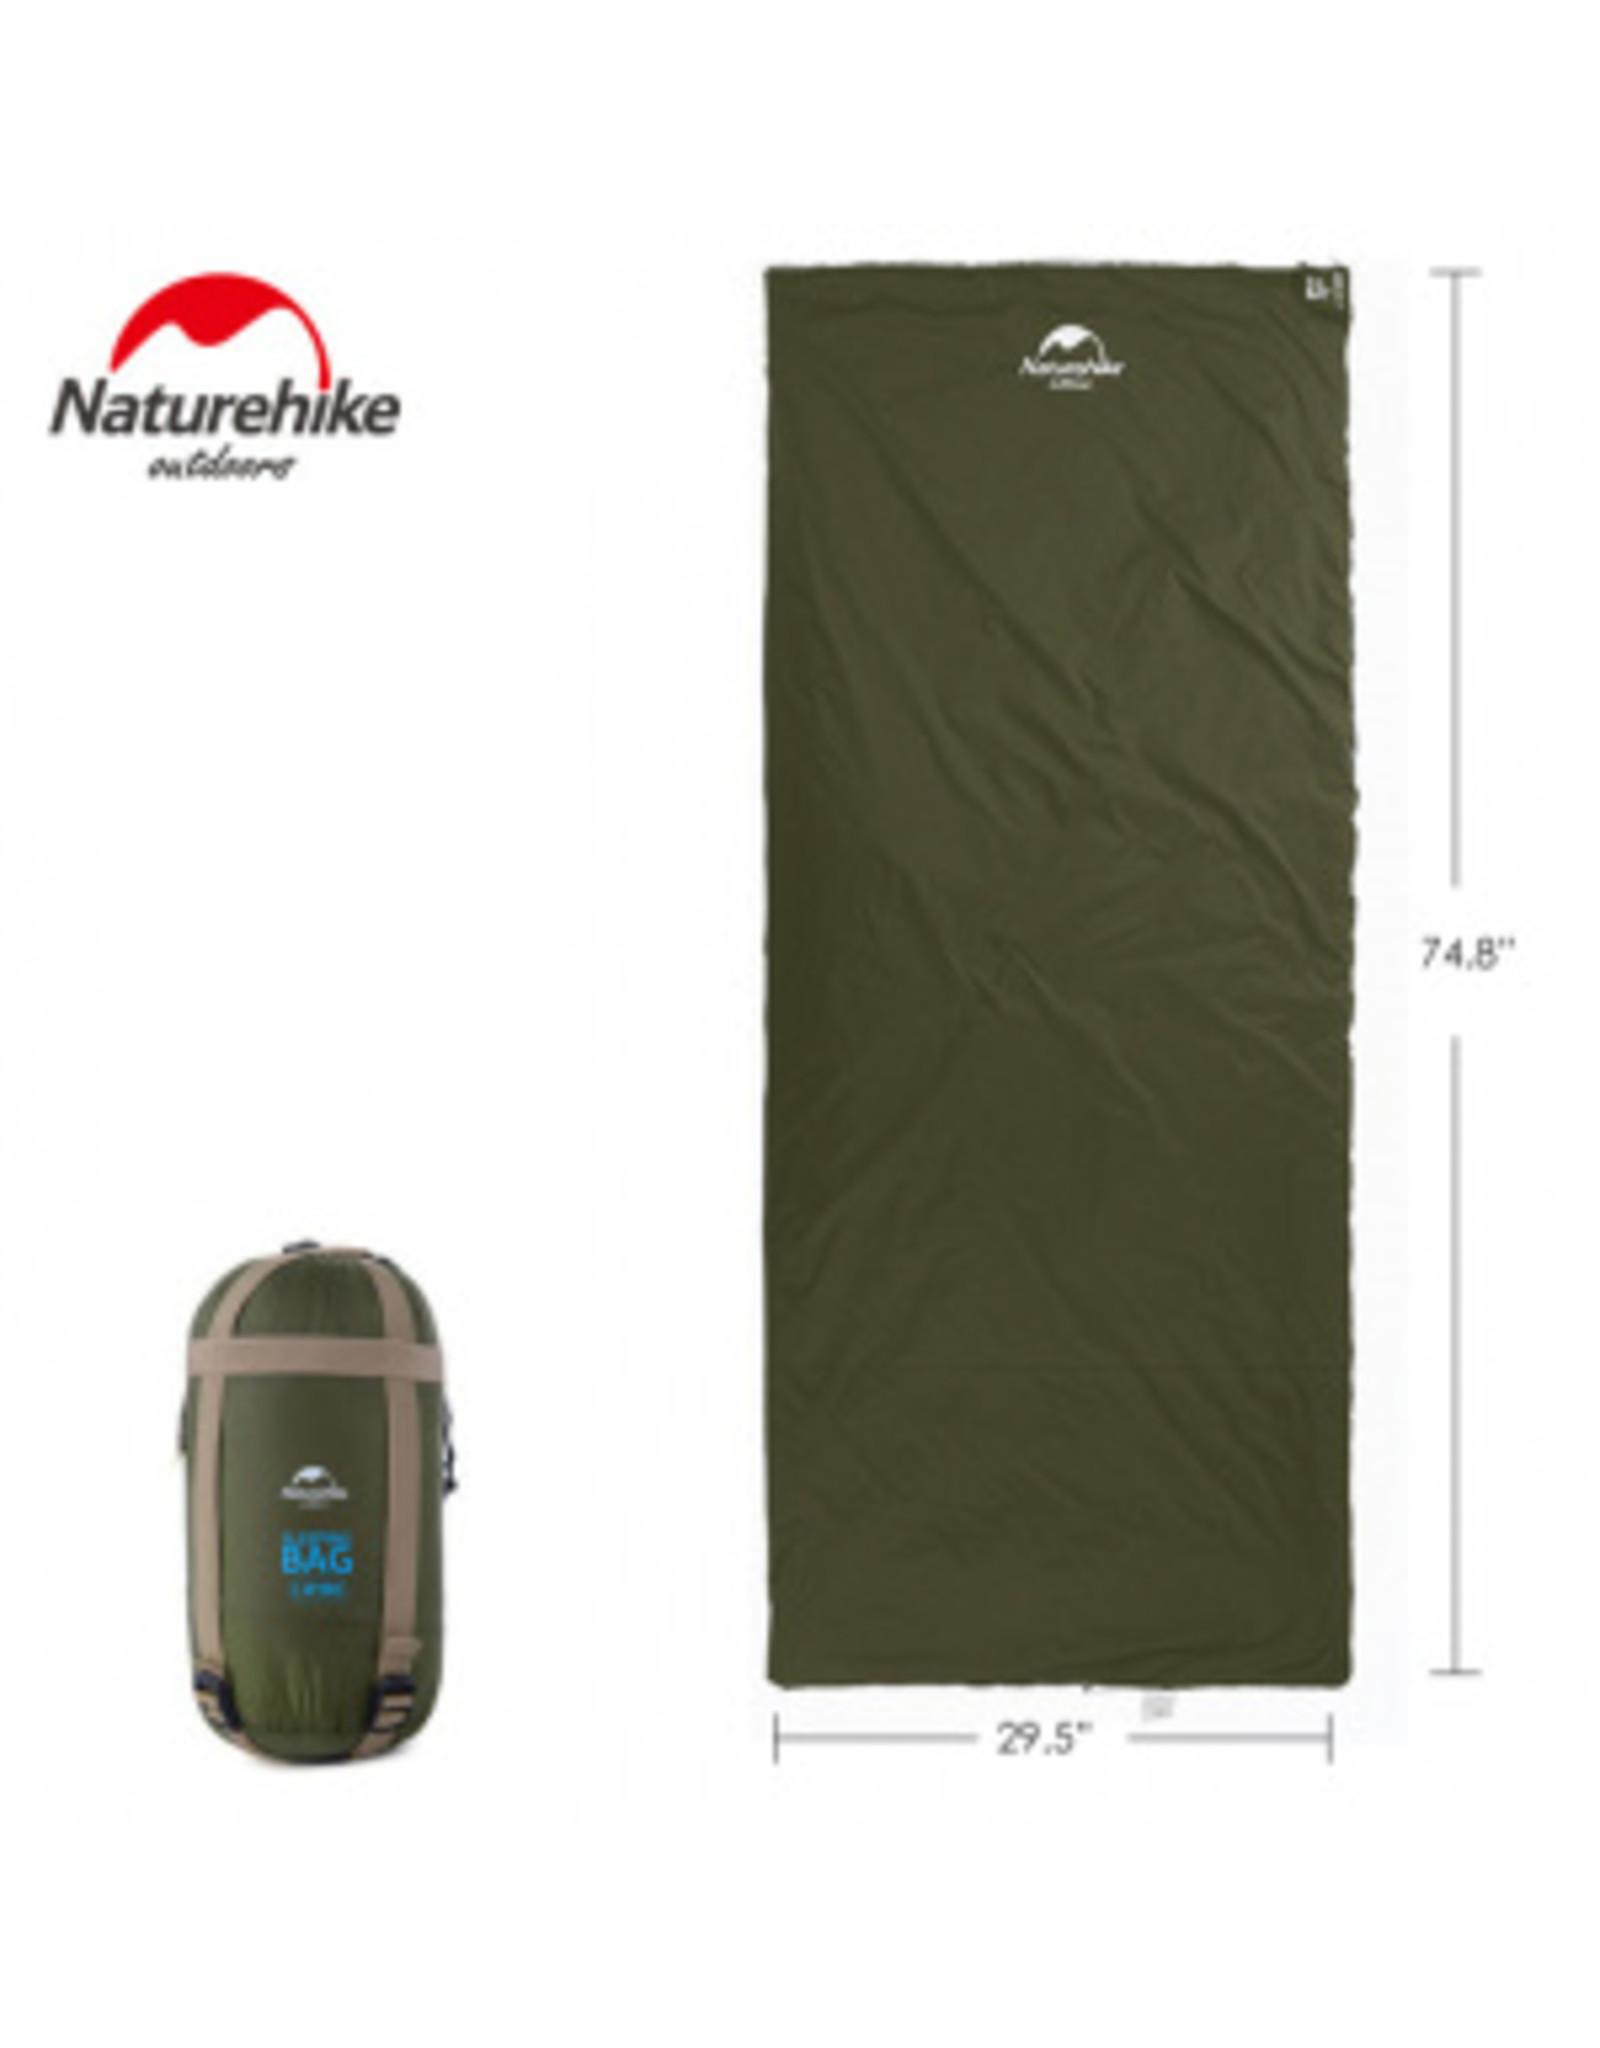 CIRCLE SALES NATURE HIKE COMPACT SLEEP BAG GREEN 15C